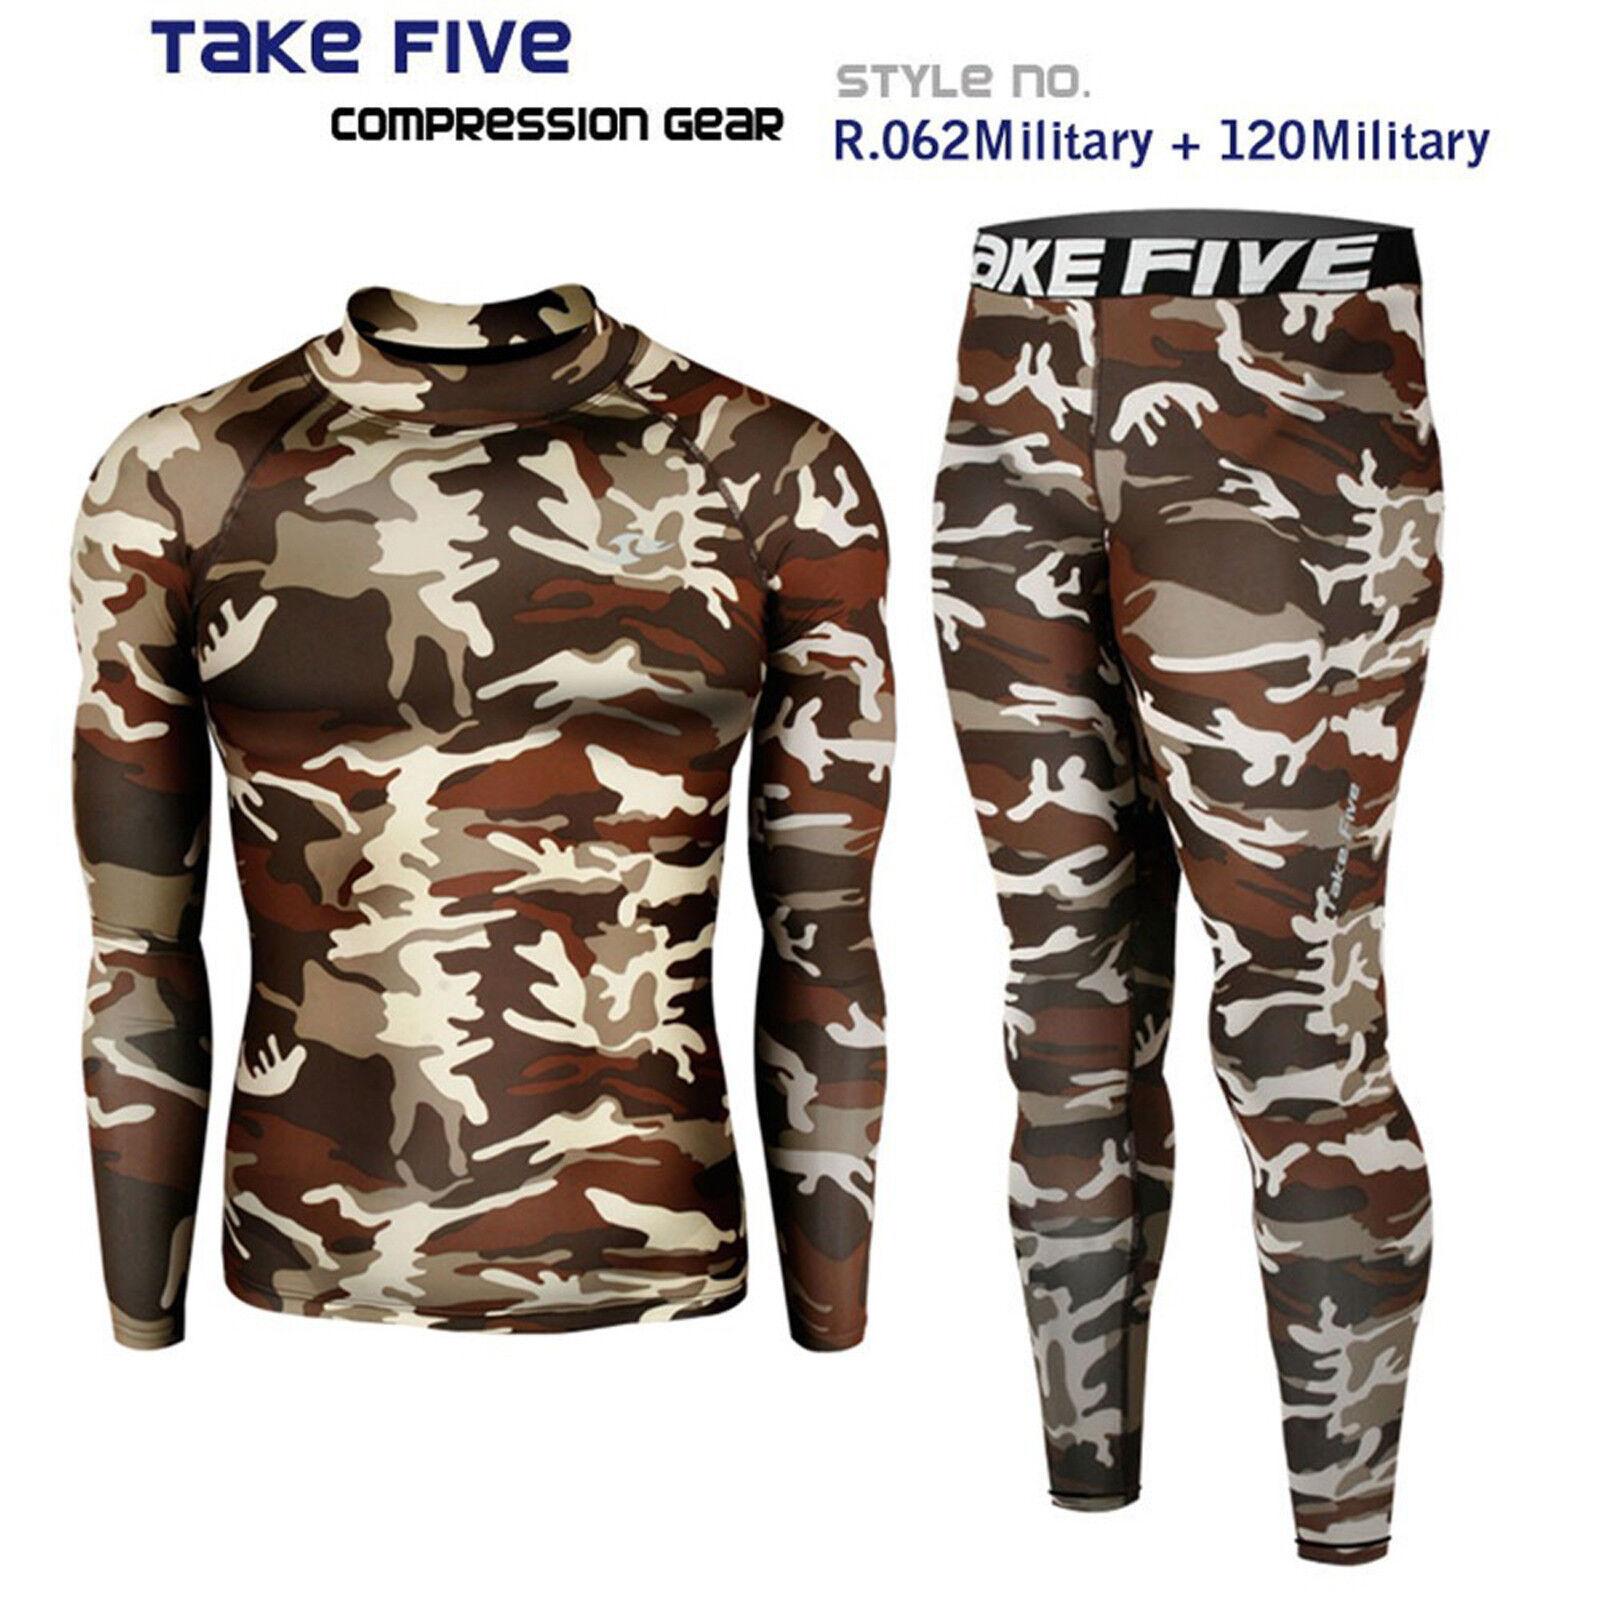 2019 New_Take Five Men's Compression Skin Tight Sports Top & Pants Sets_062+120